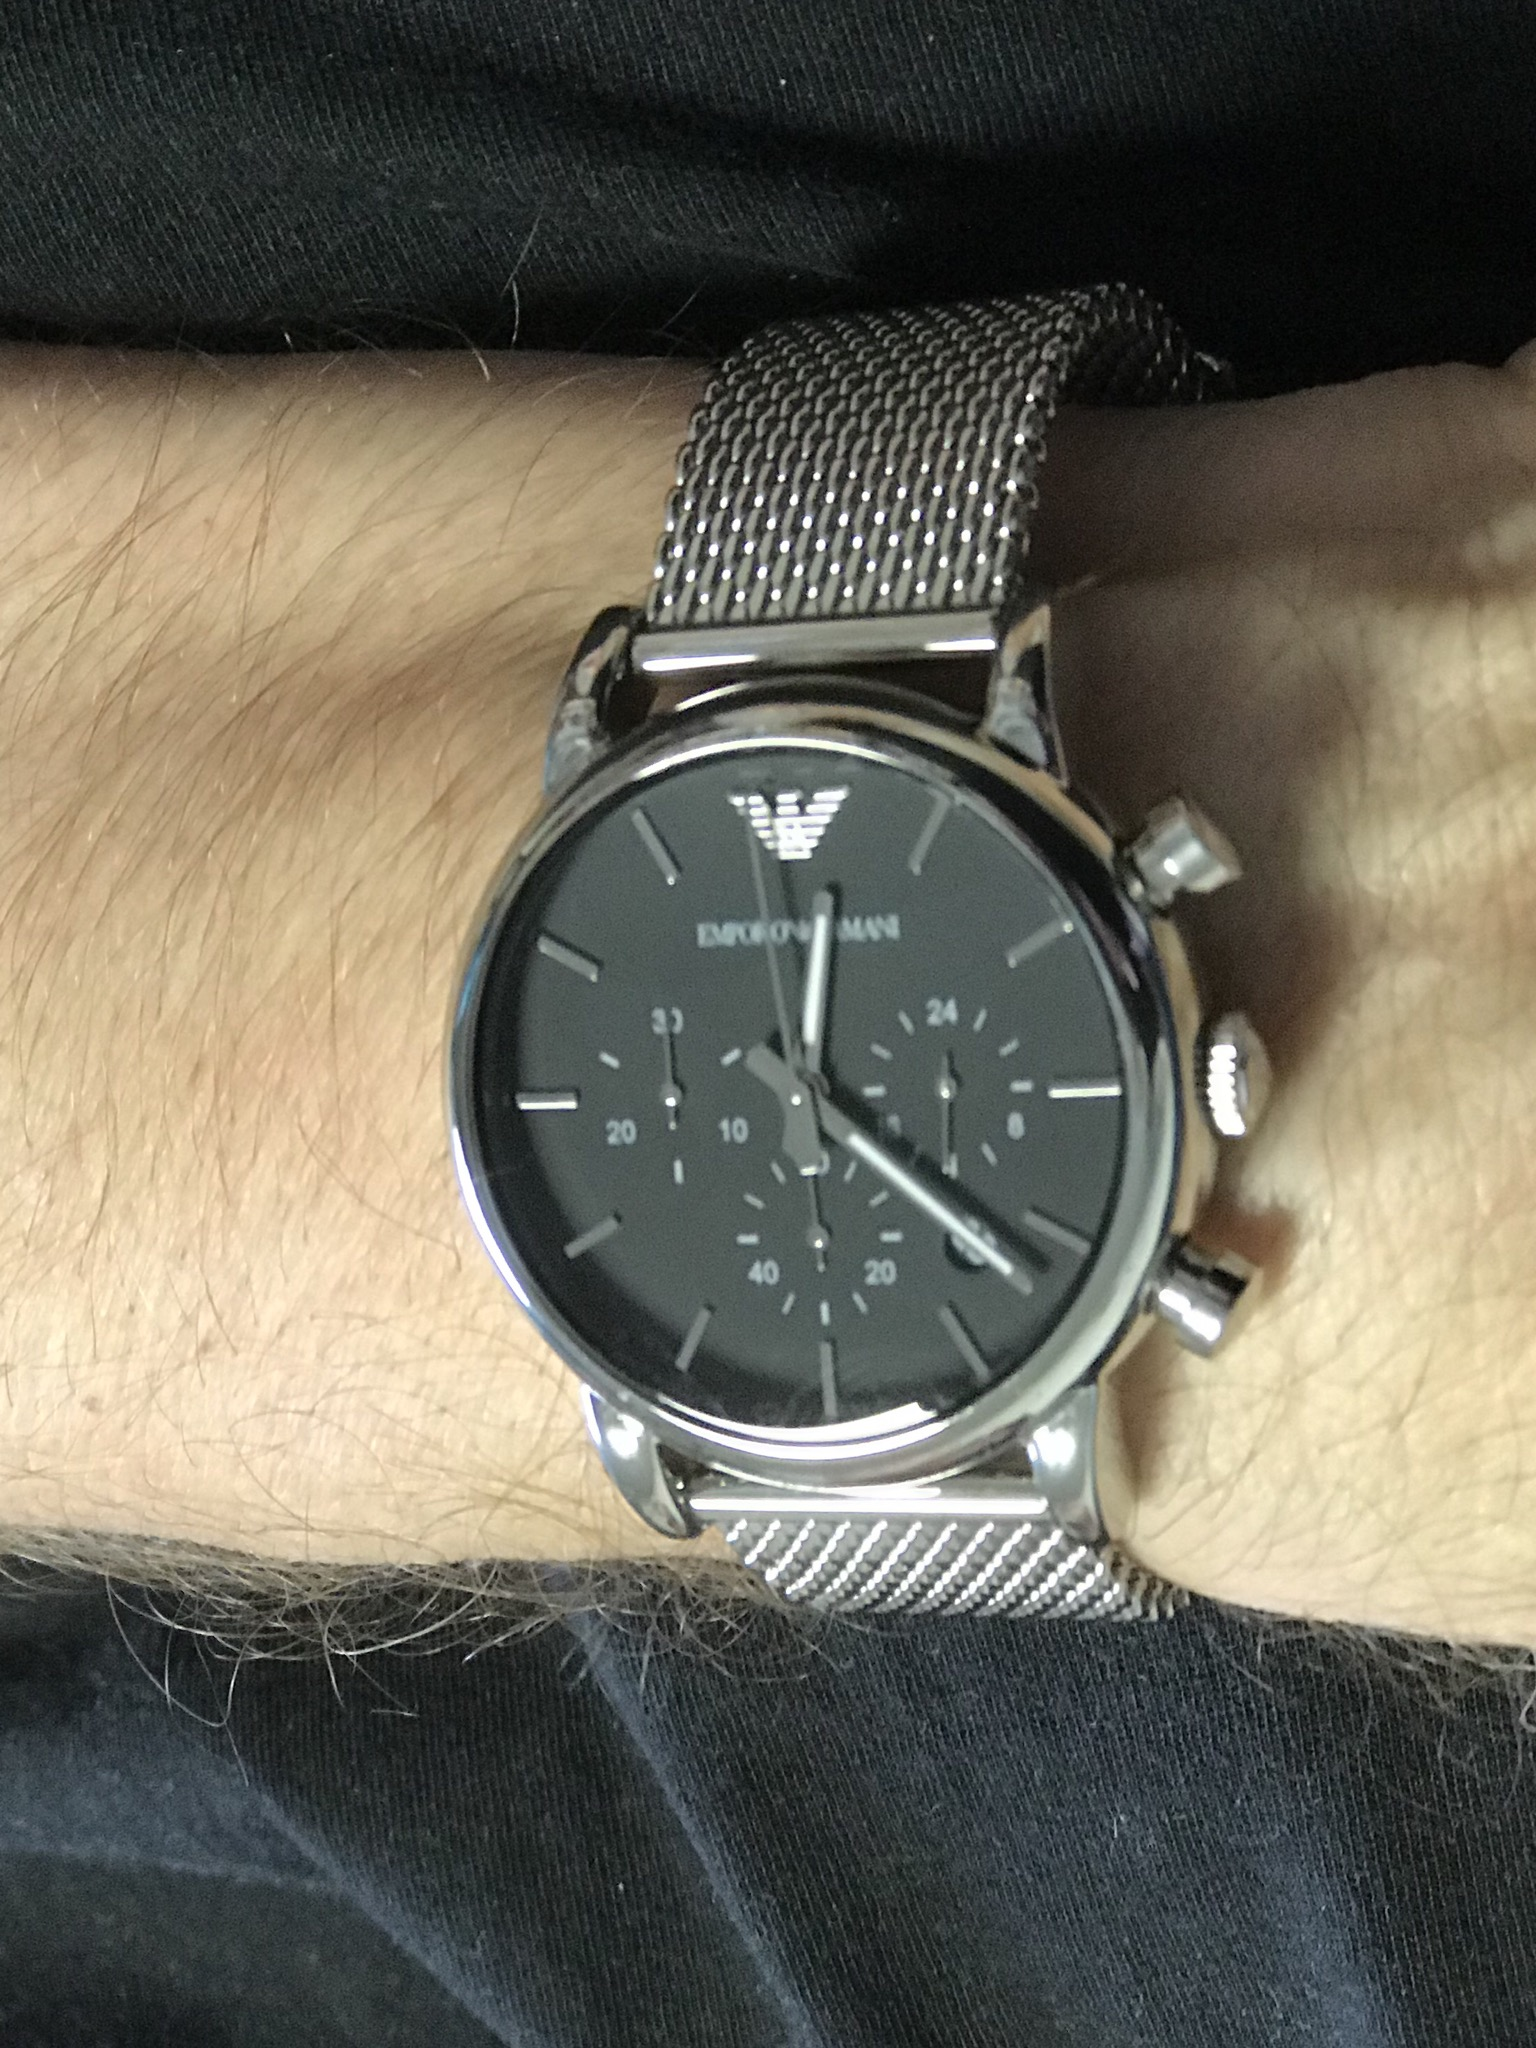 891260e3131 Gents Emporio Armani Chronograph Watch (AR1811)